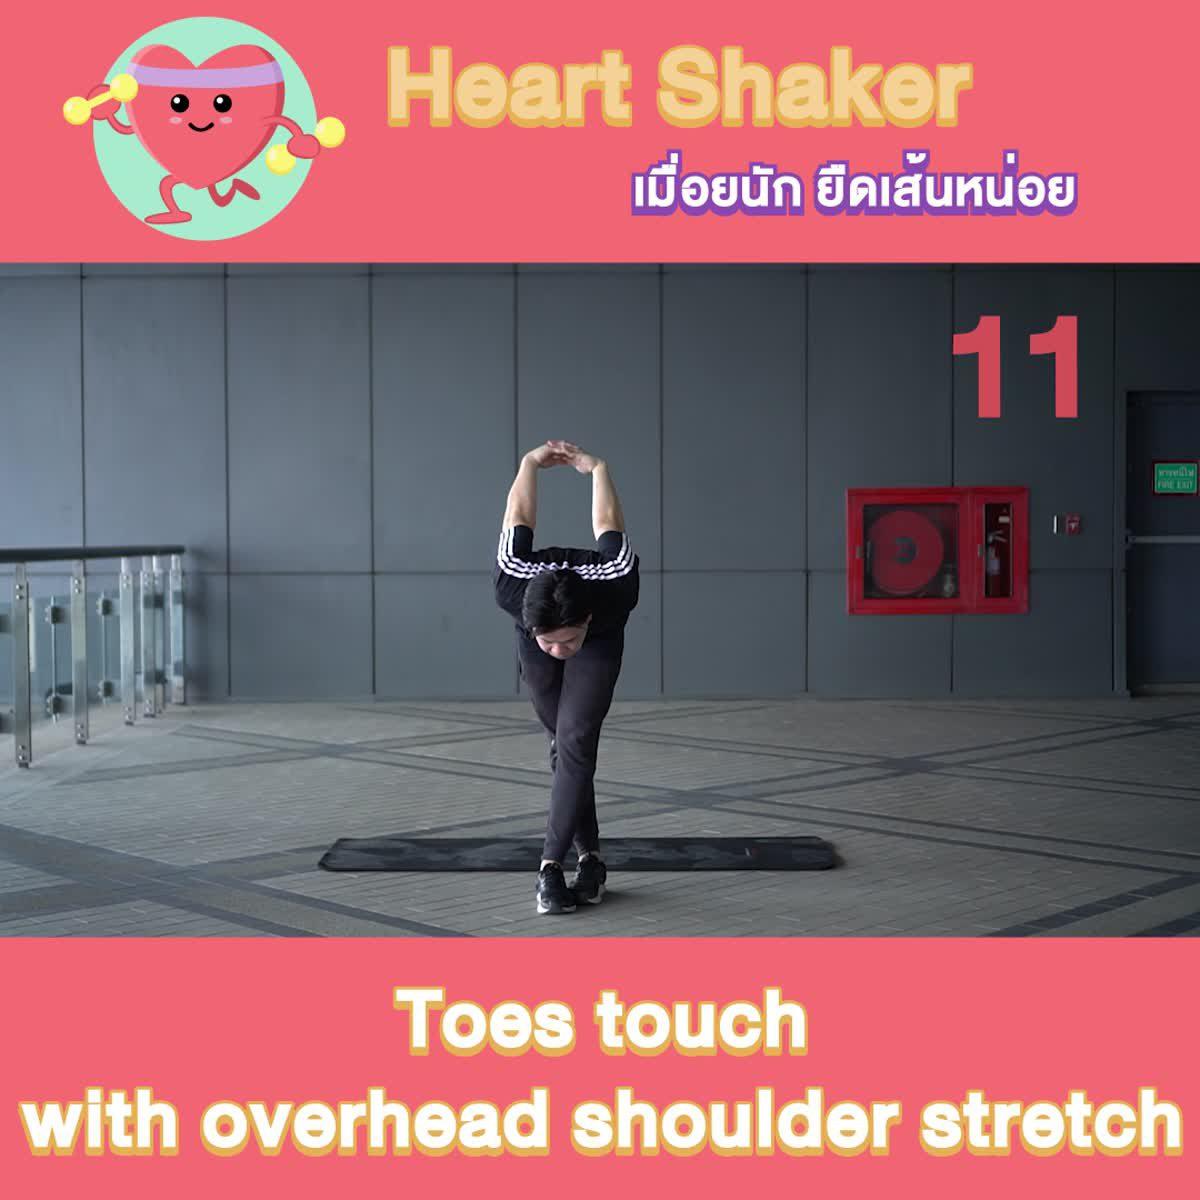 Heart shaker กับนายหุ่นล่ำ Ep.8 เมื่อยนักยืดเส้นหน่อย